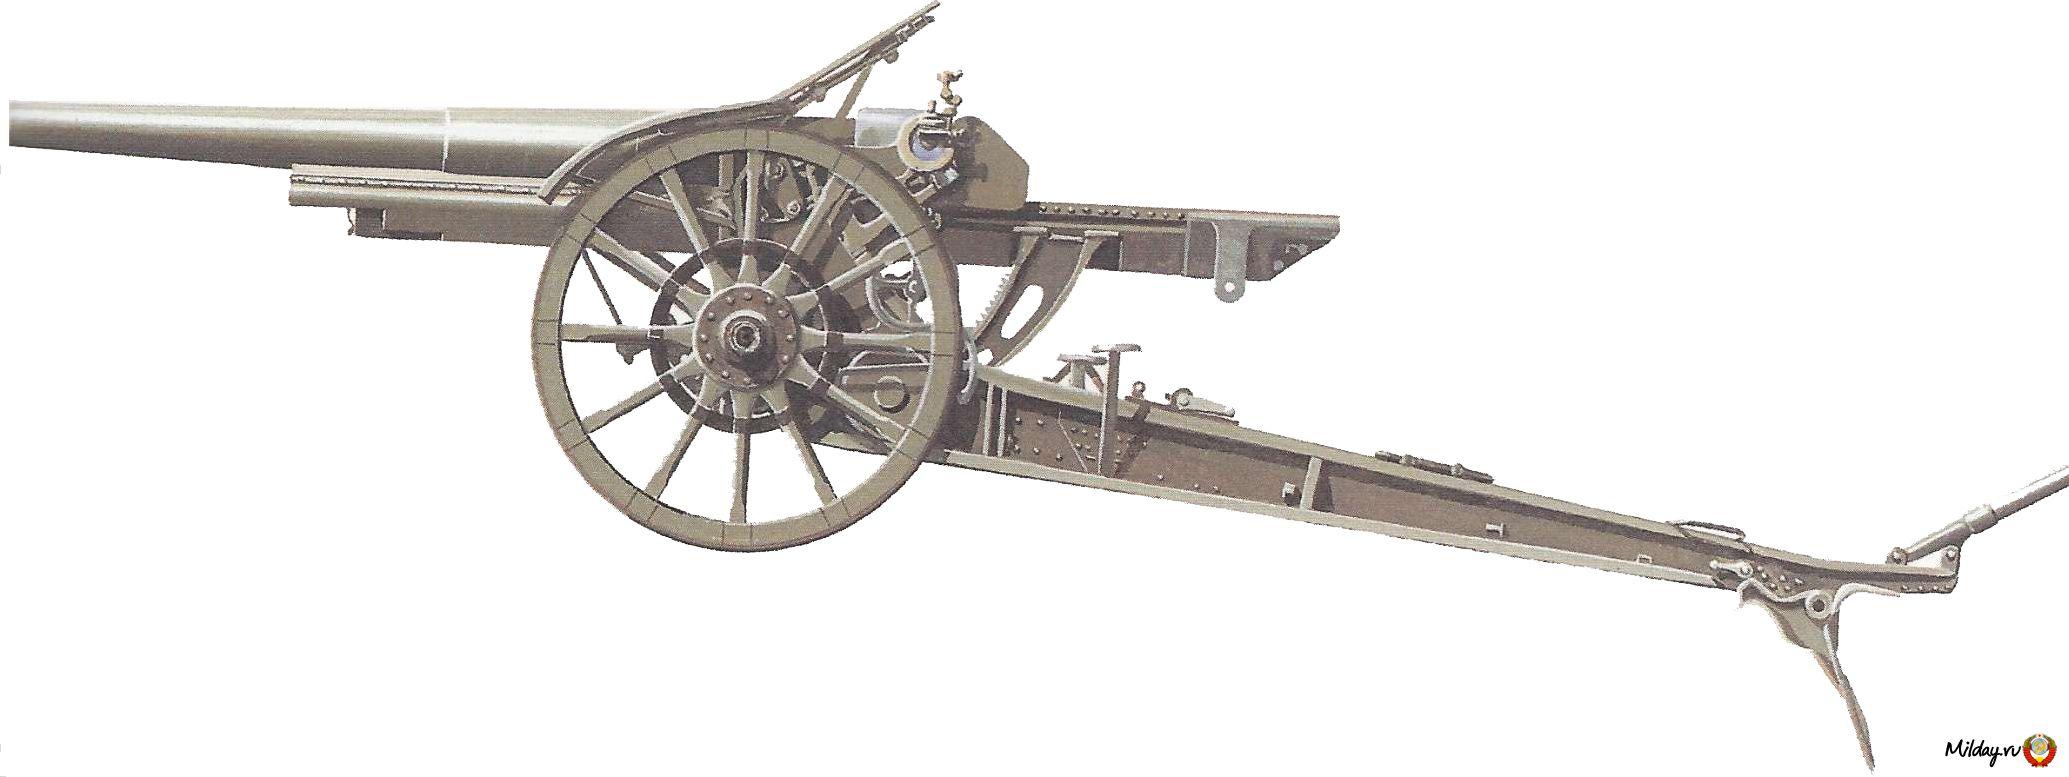 Полевая 105-мм пушка образца 1913 года концерна «Шнейдер»